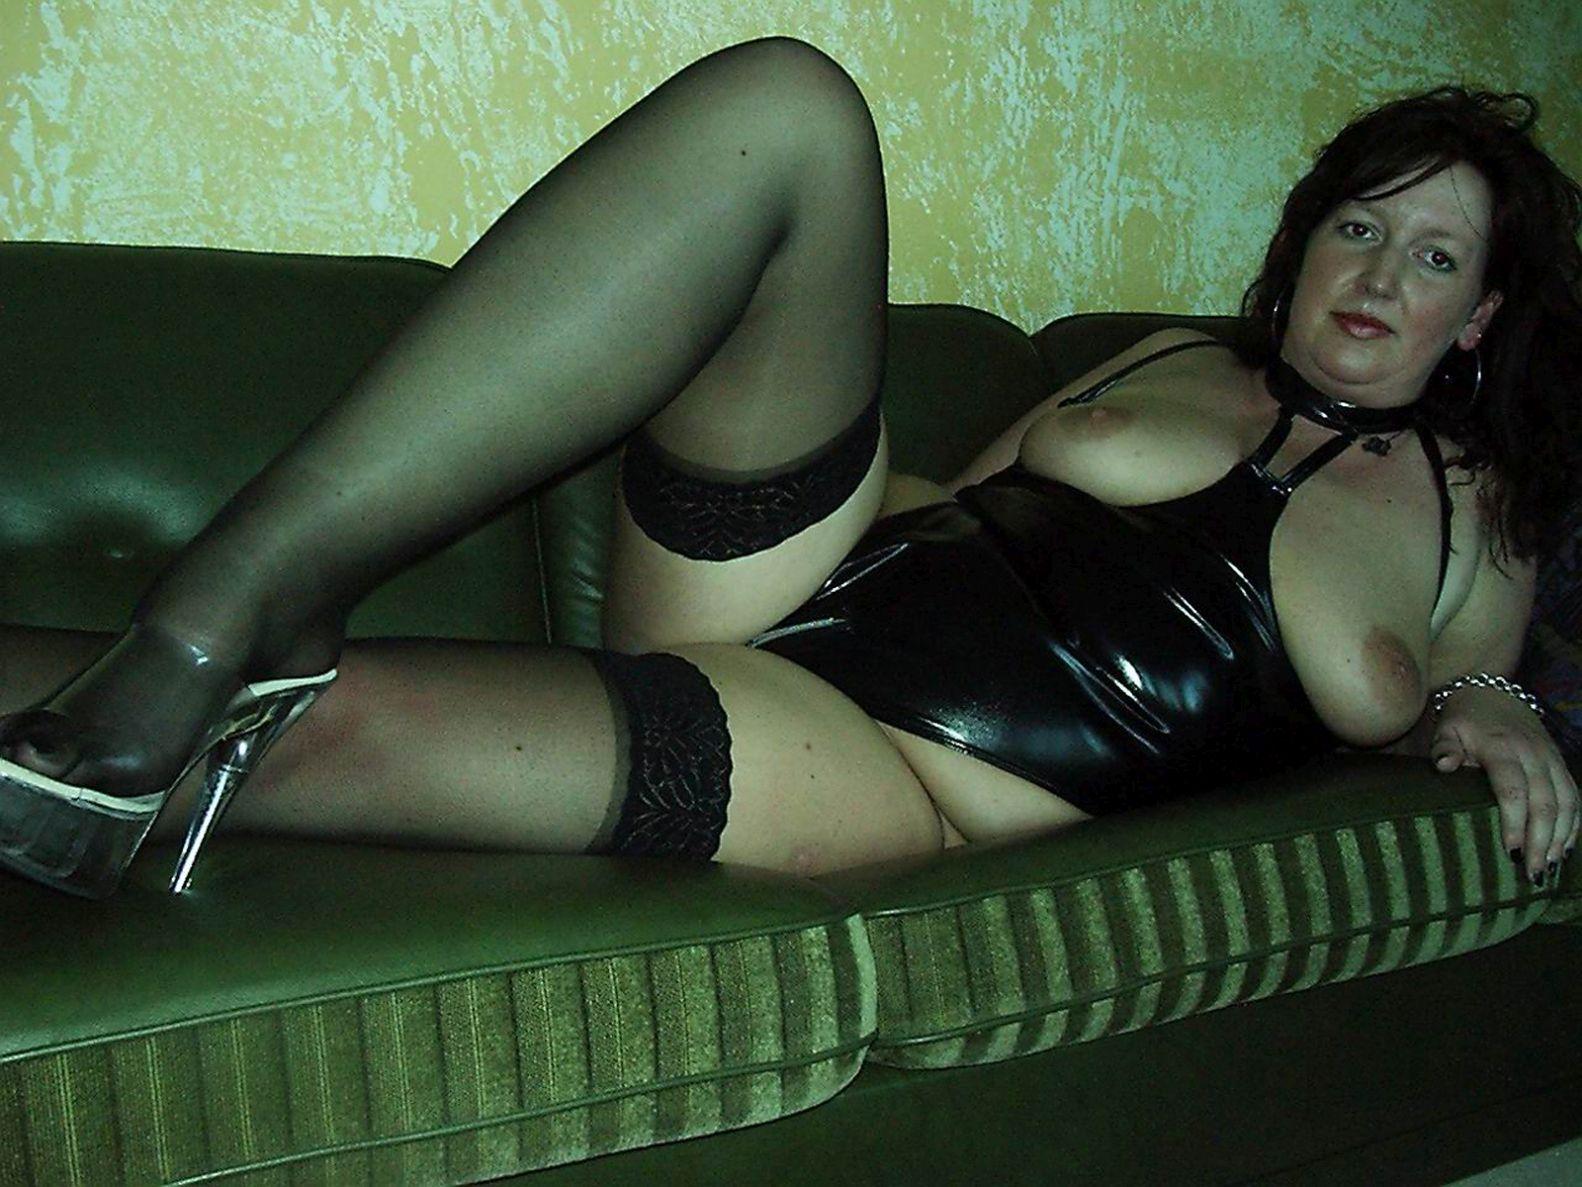 Sexkontakte Spremberg